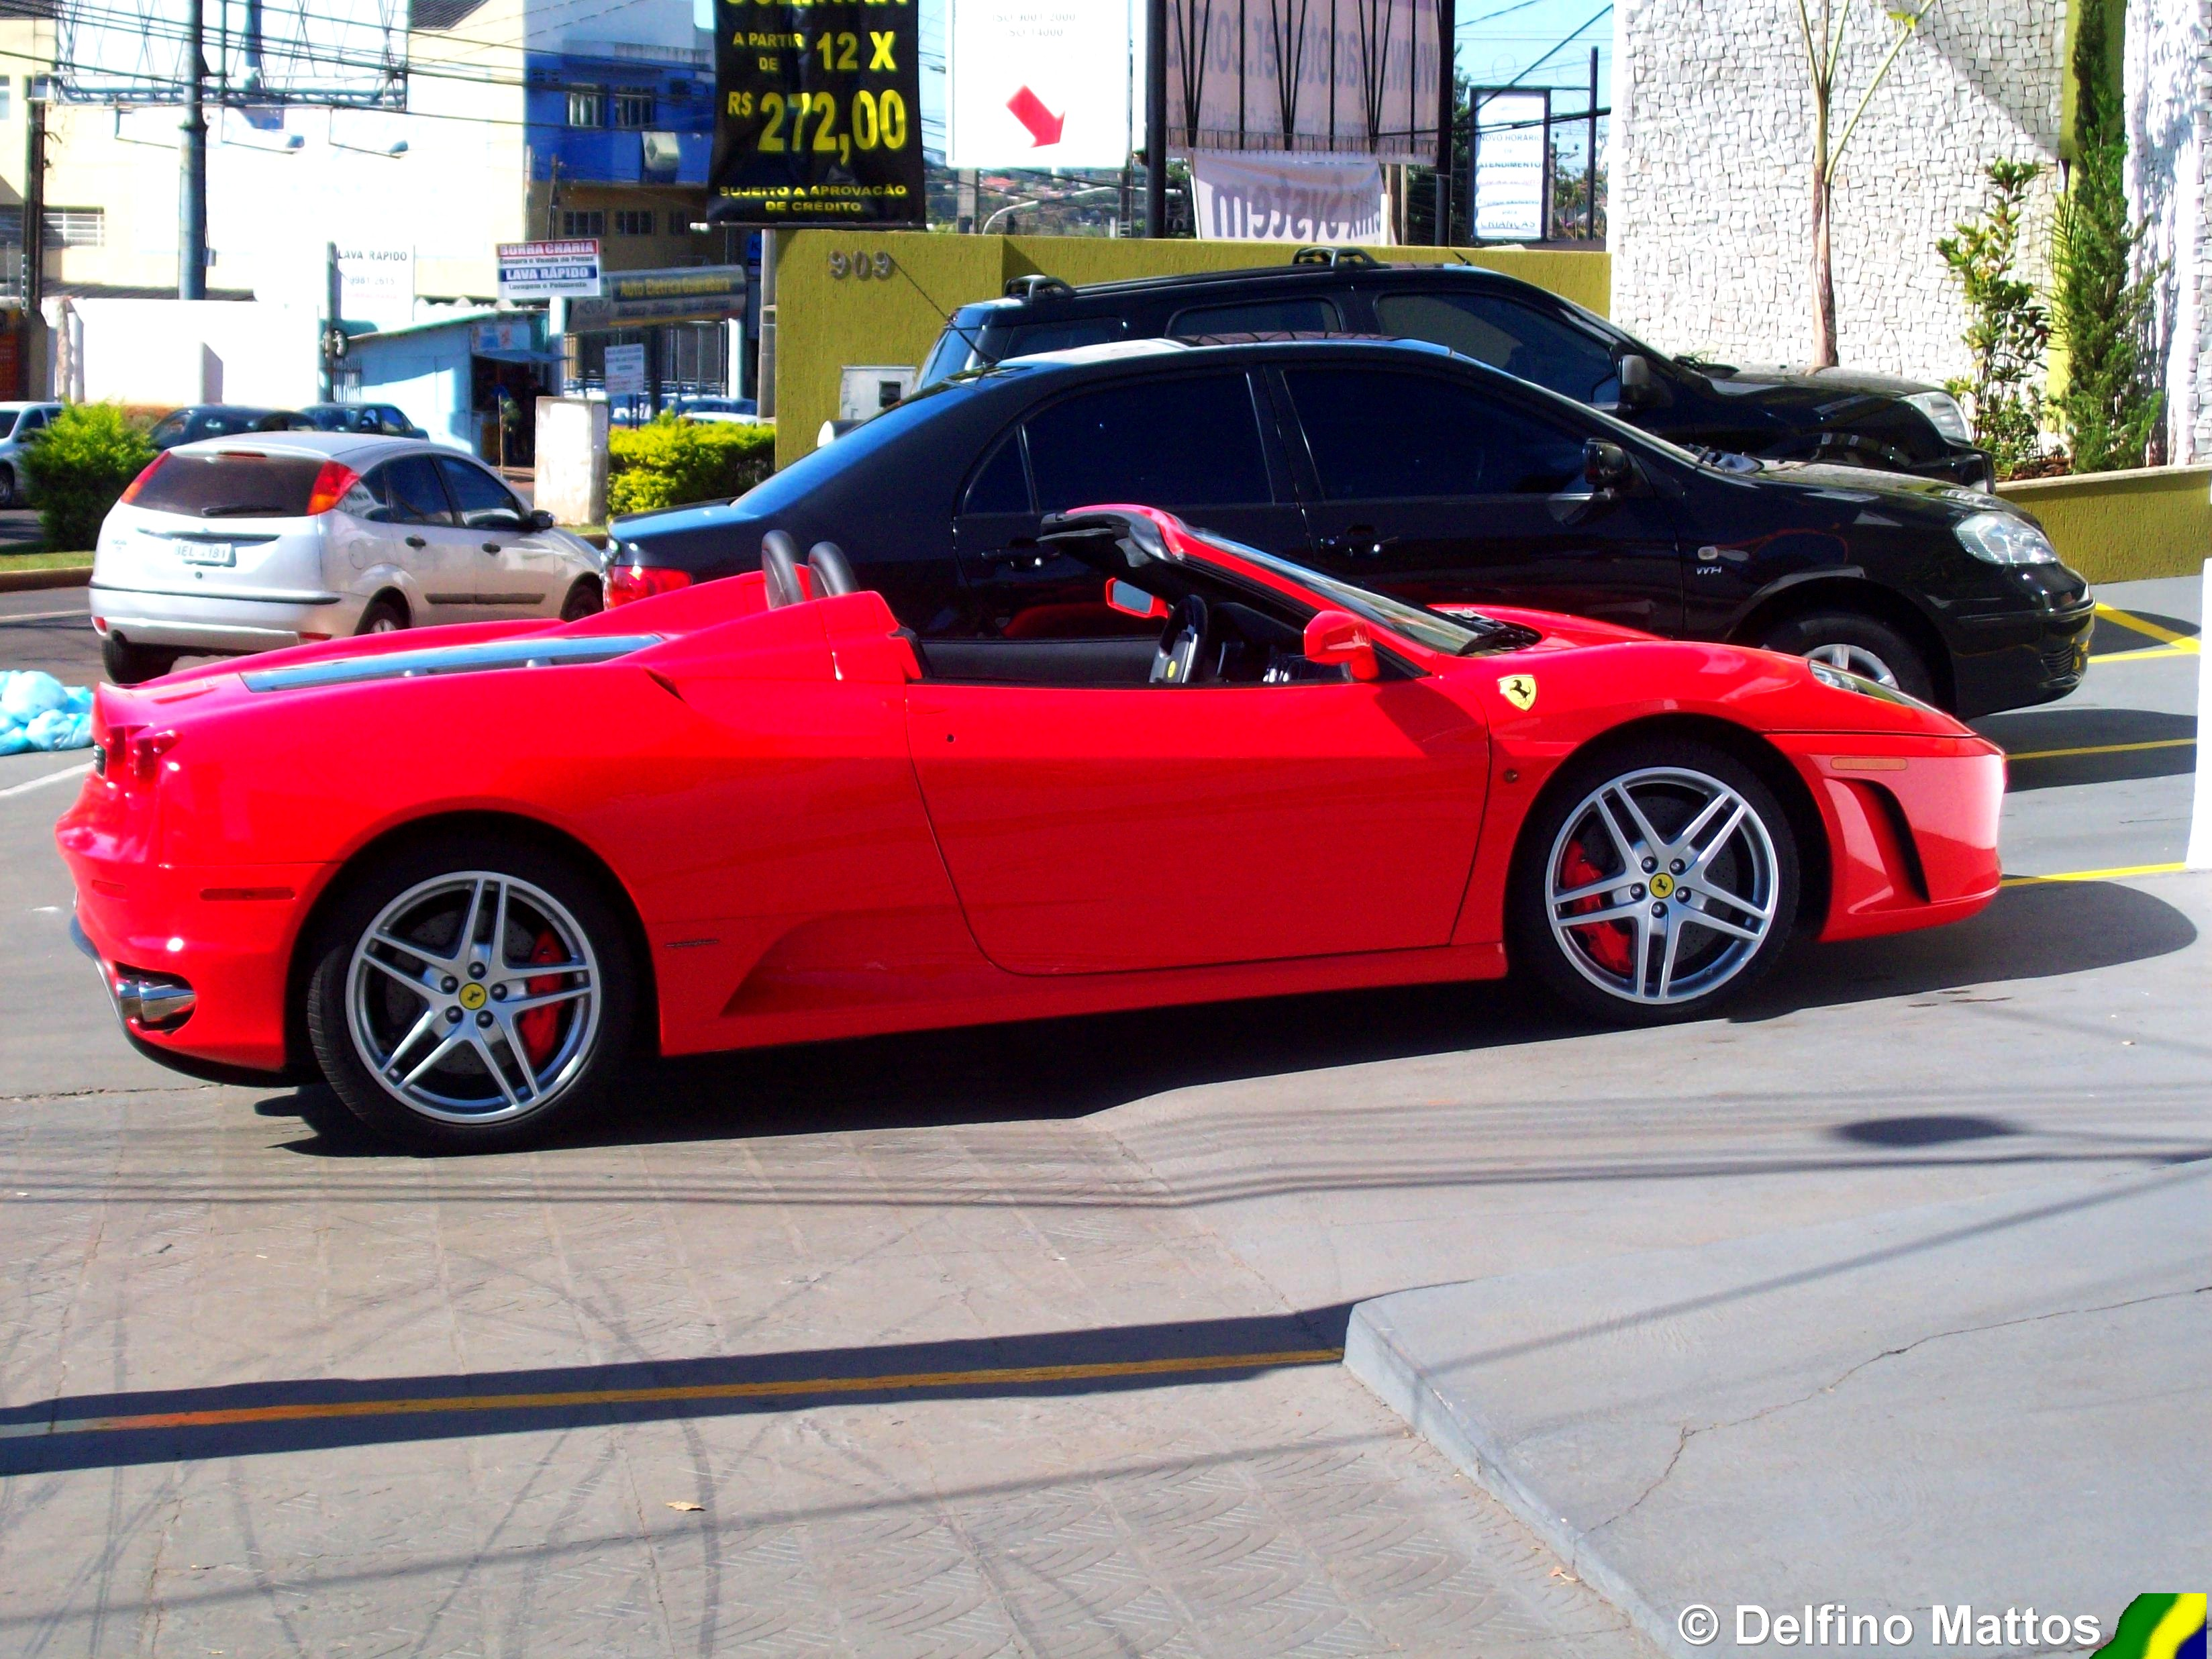 76552_FerrariF430Spider44_122_164lo.JPG